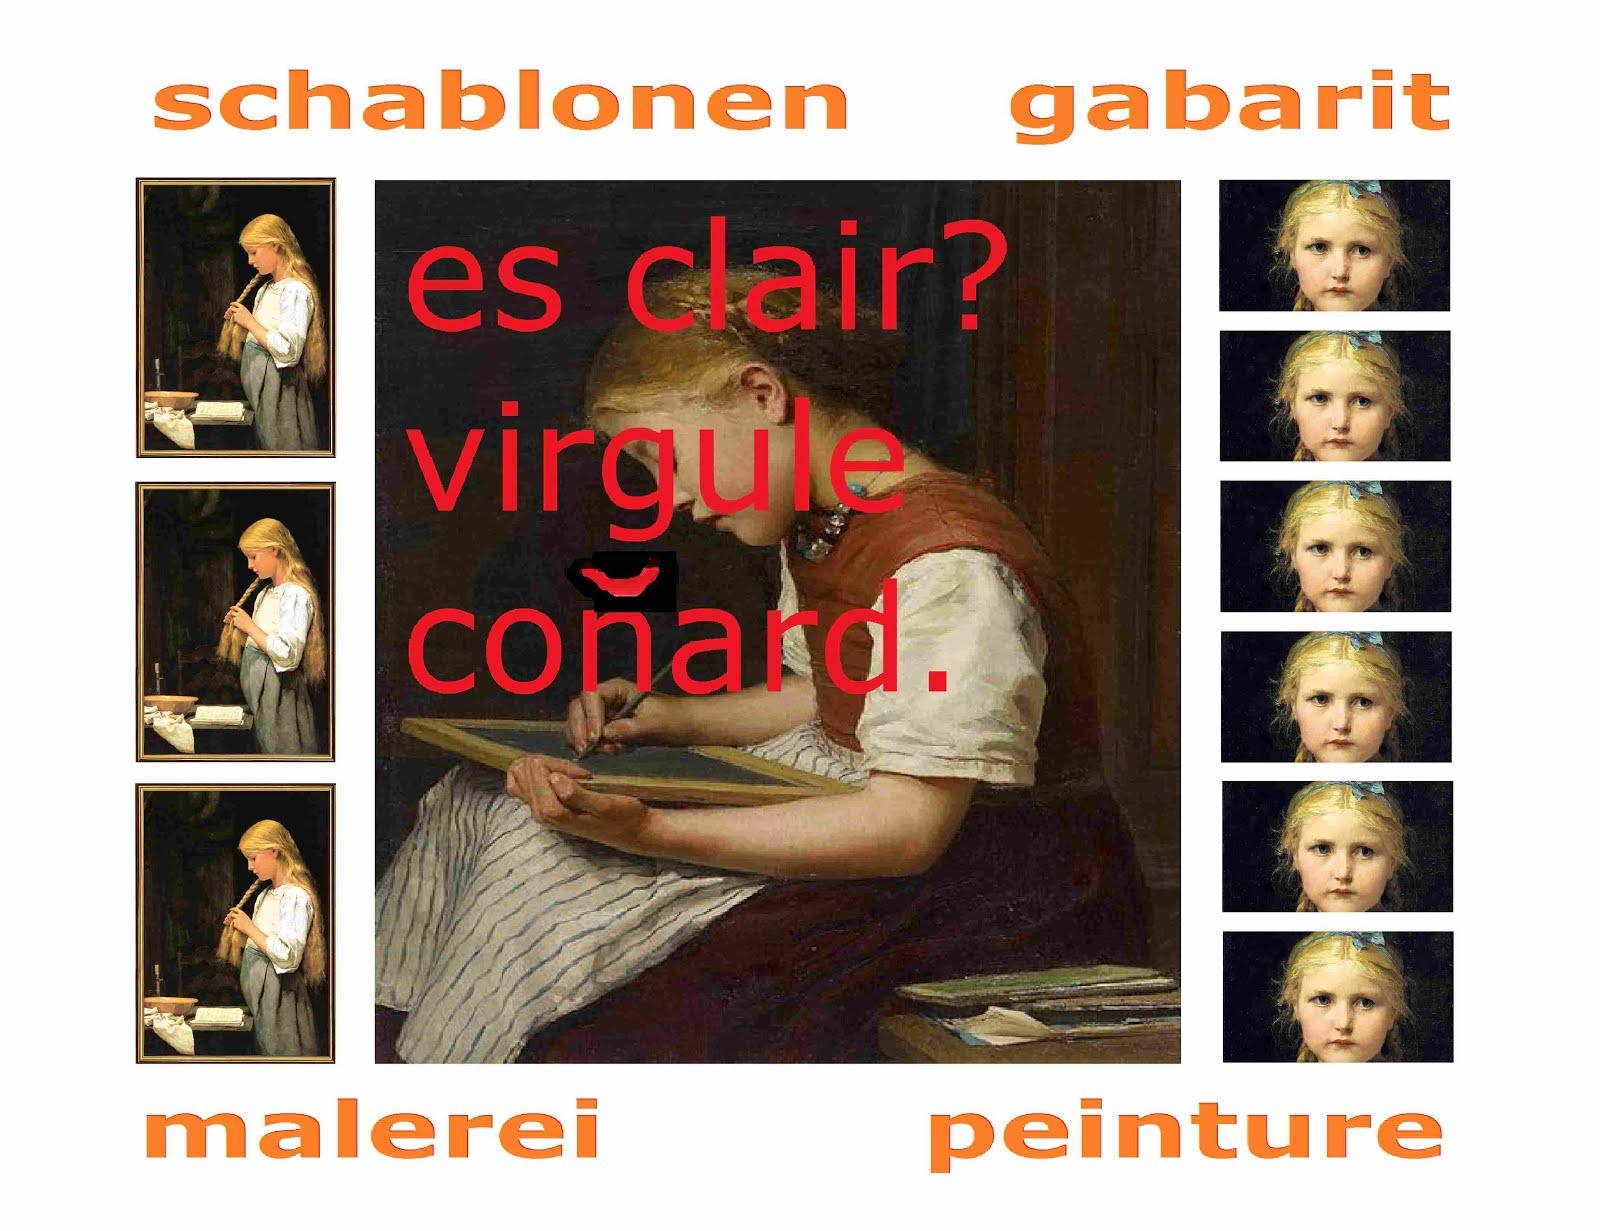 gabarit schablonen denken malerei peinture collection privée bloCHer anker mischa vetere DE retour